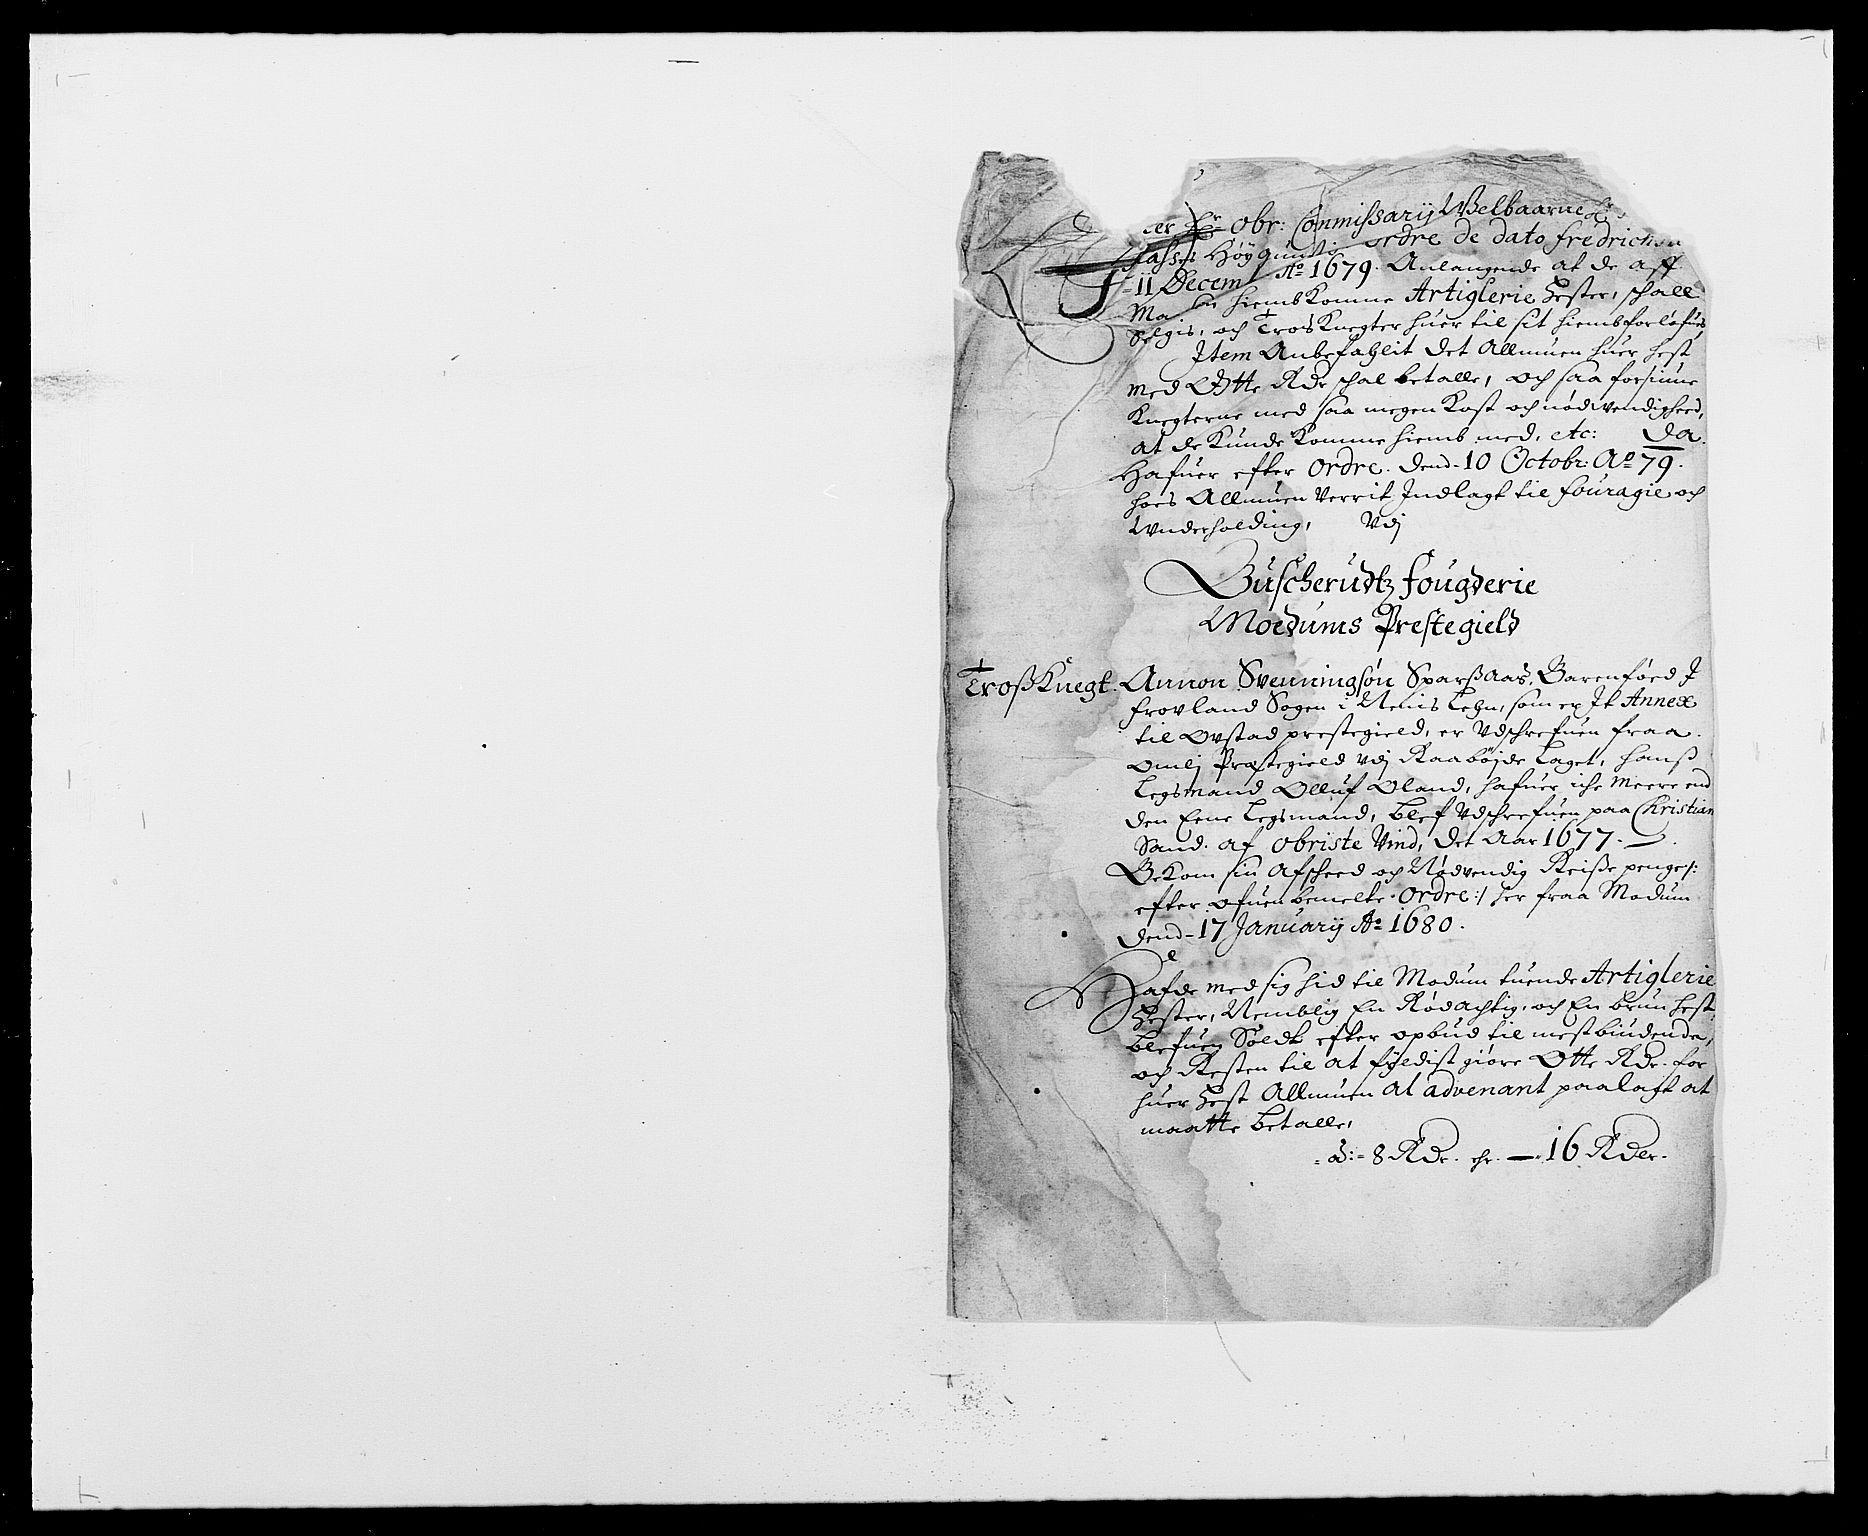 RA, Rentekammeret inntil 1814, Reviderte regnskaper, Fogderegnskap, R25/L1674: Fogderegnskap Buskerud, 1678-1681, s. 387